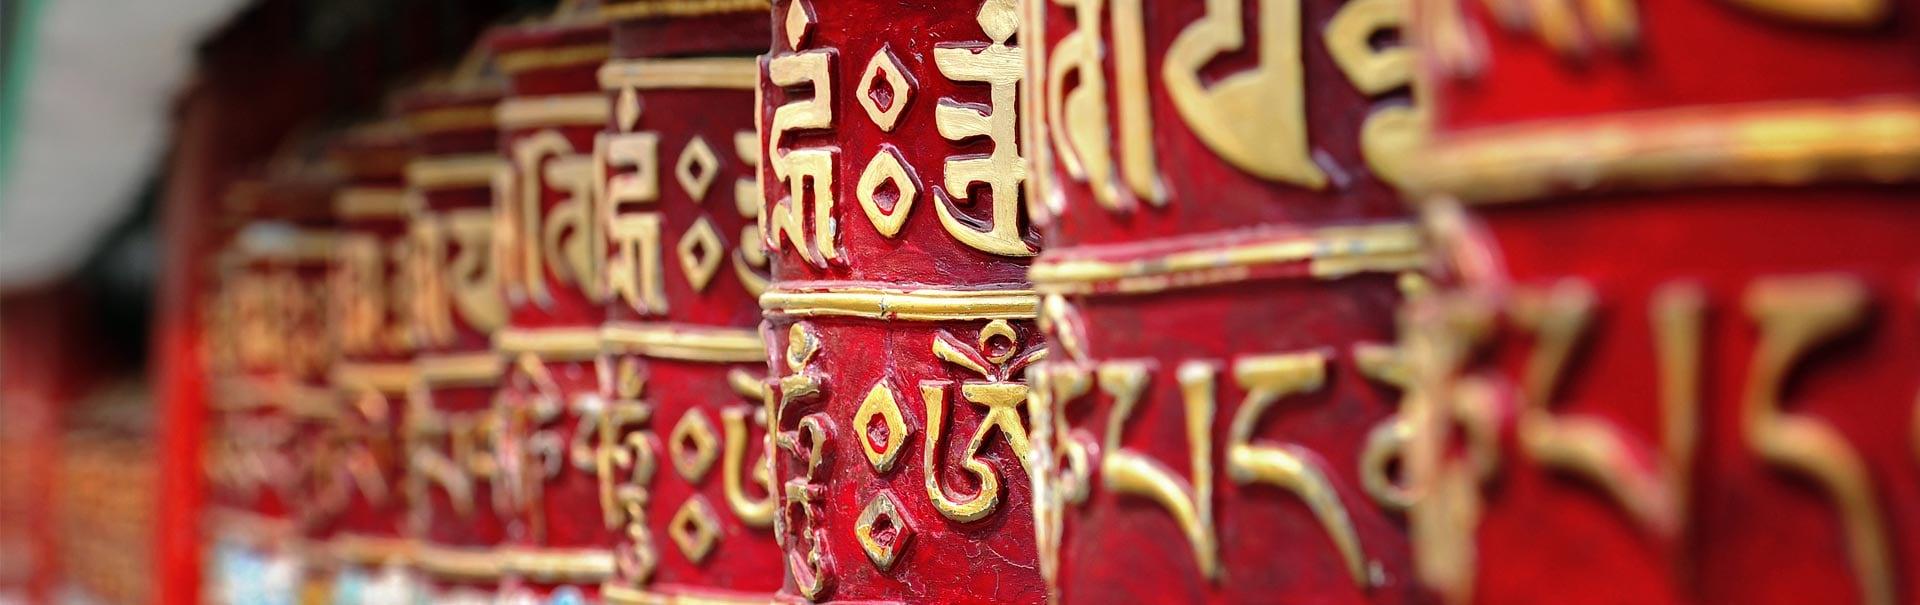 Bhutan Escape (SHBT3) Banner